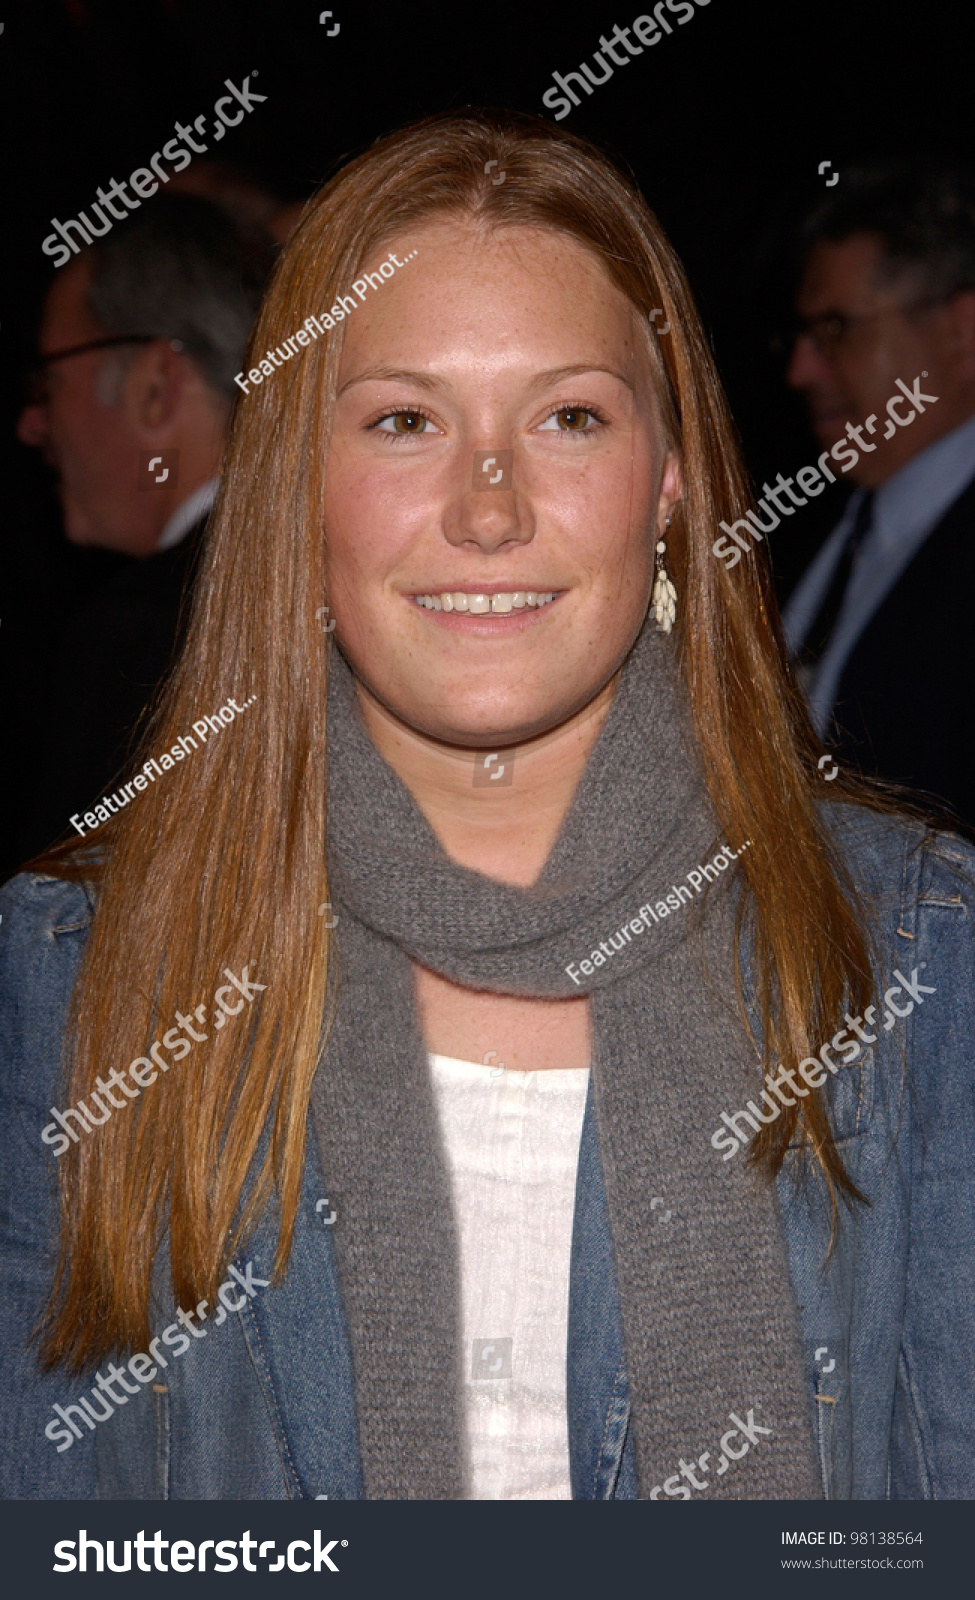 Natalie Hall born January 25, 1990 (age 28)